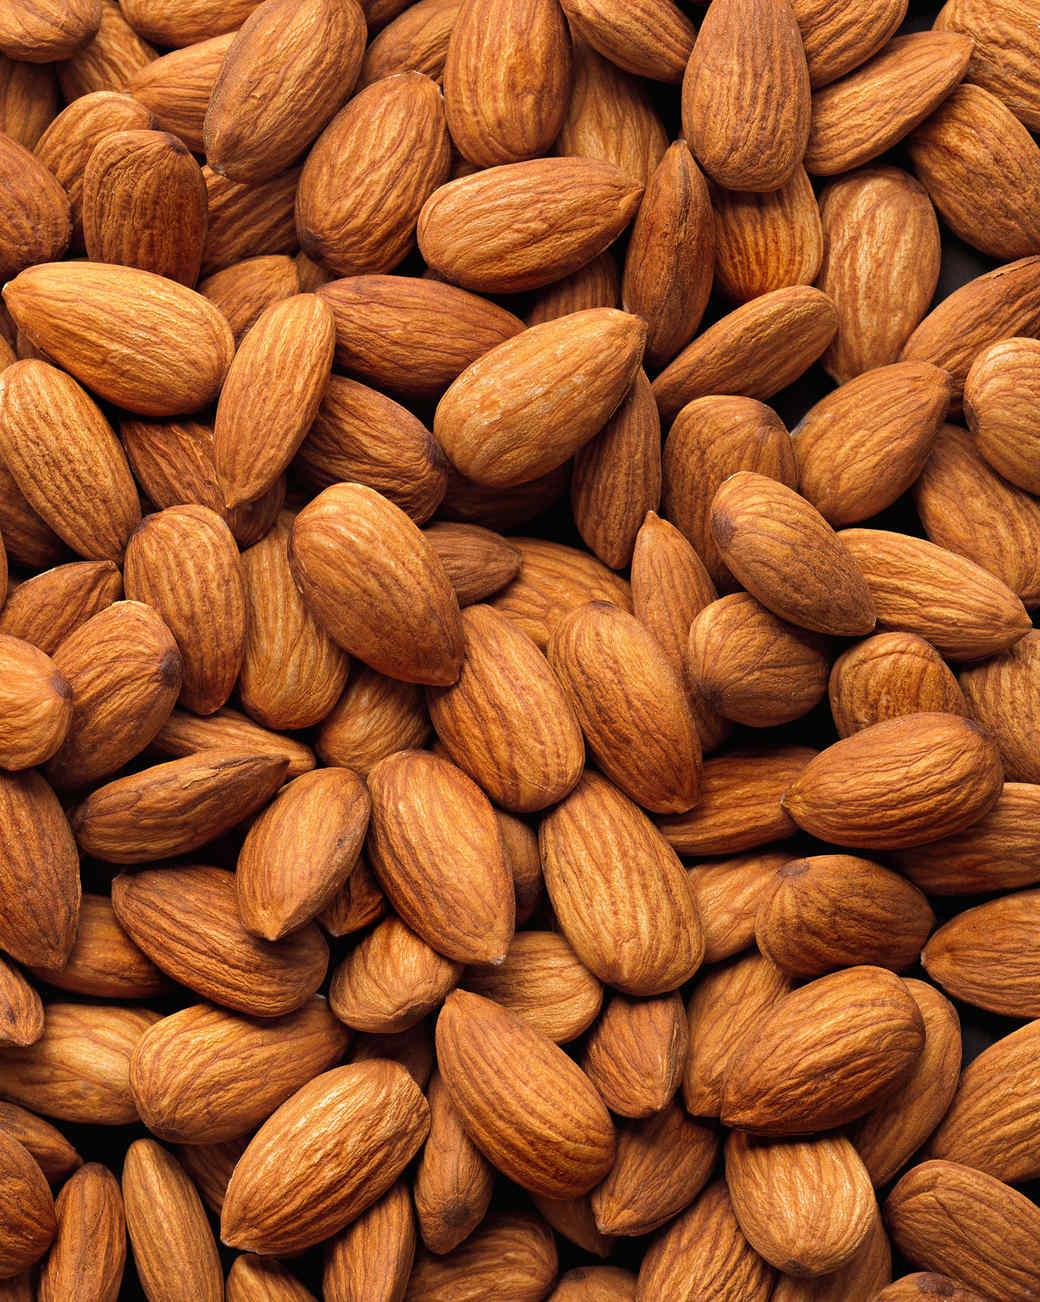 Almonds in California